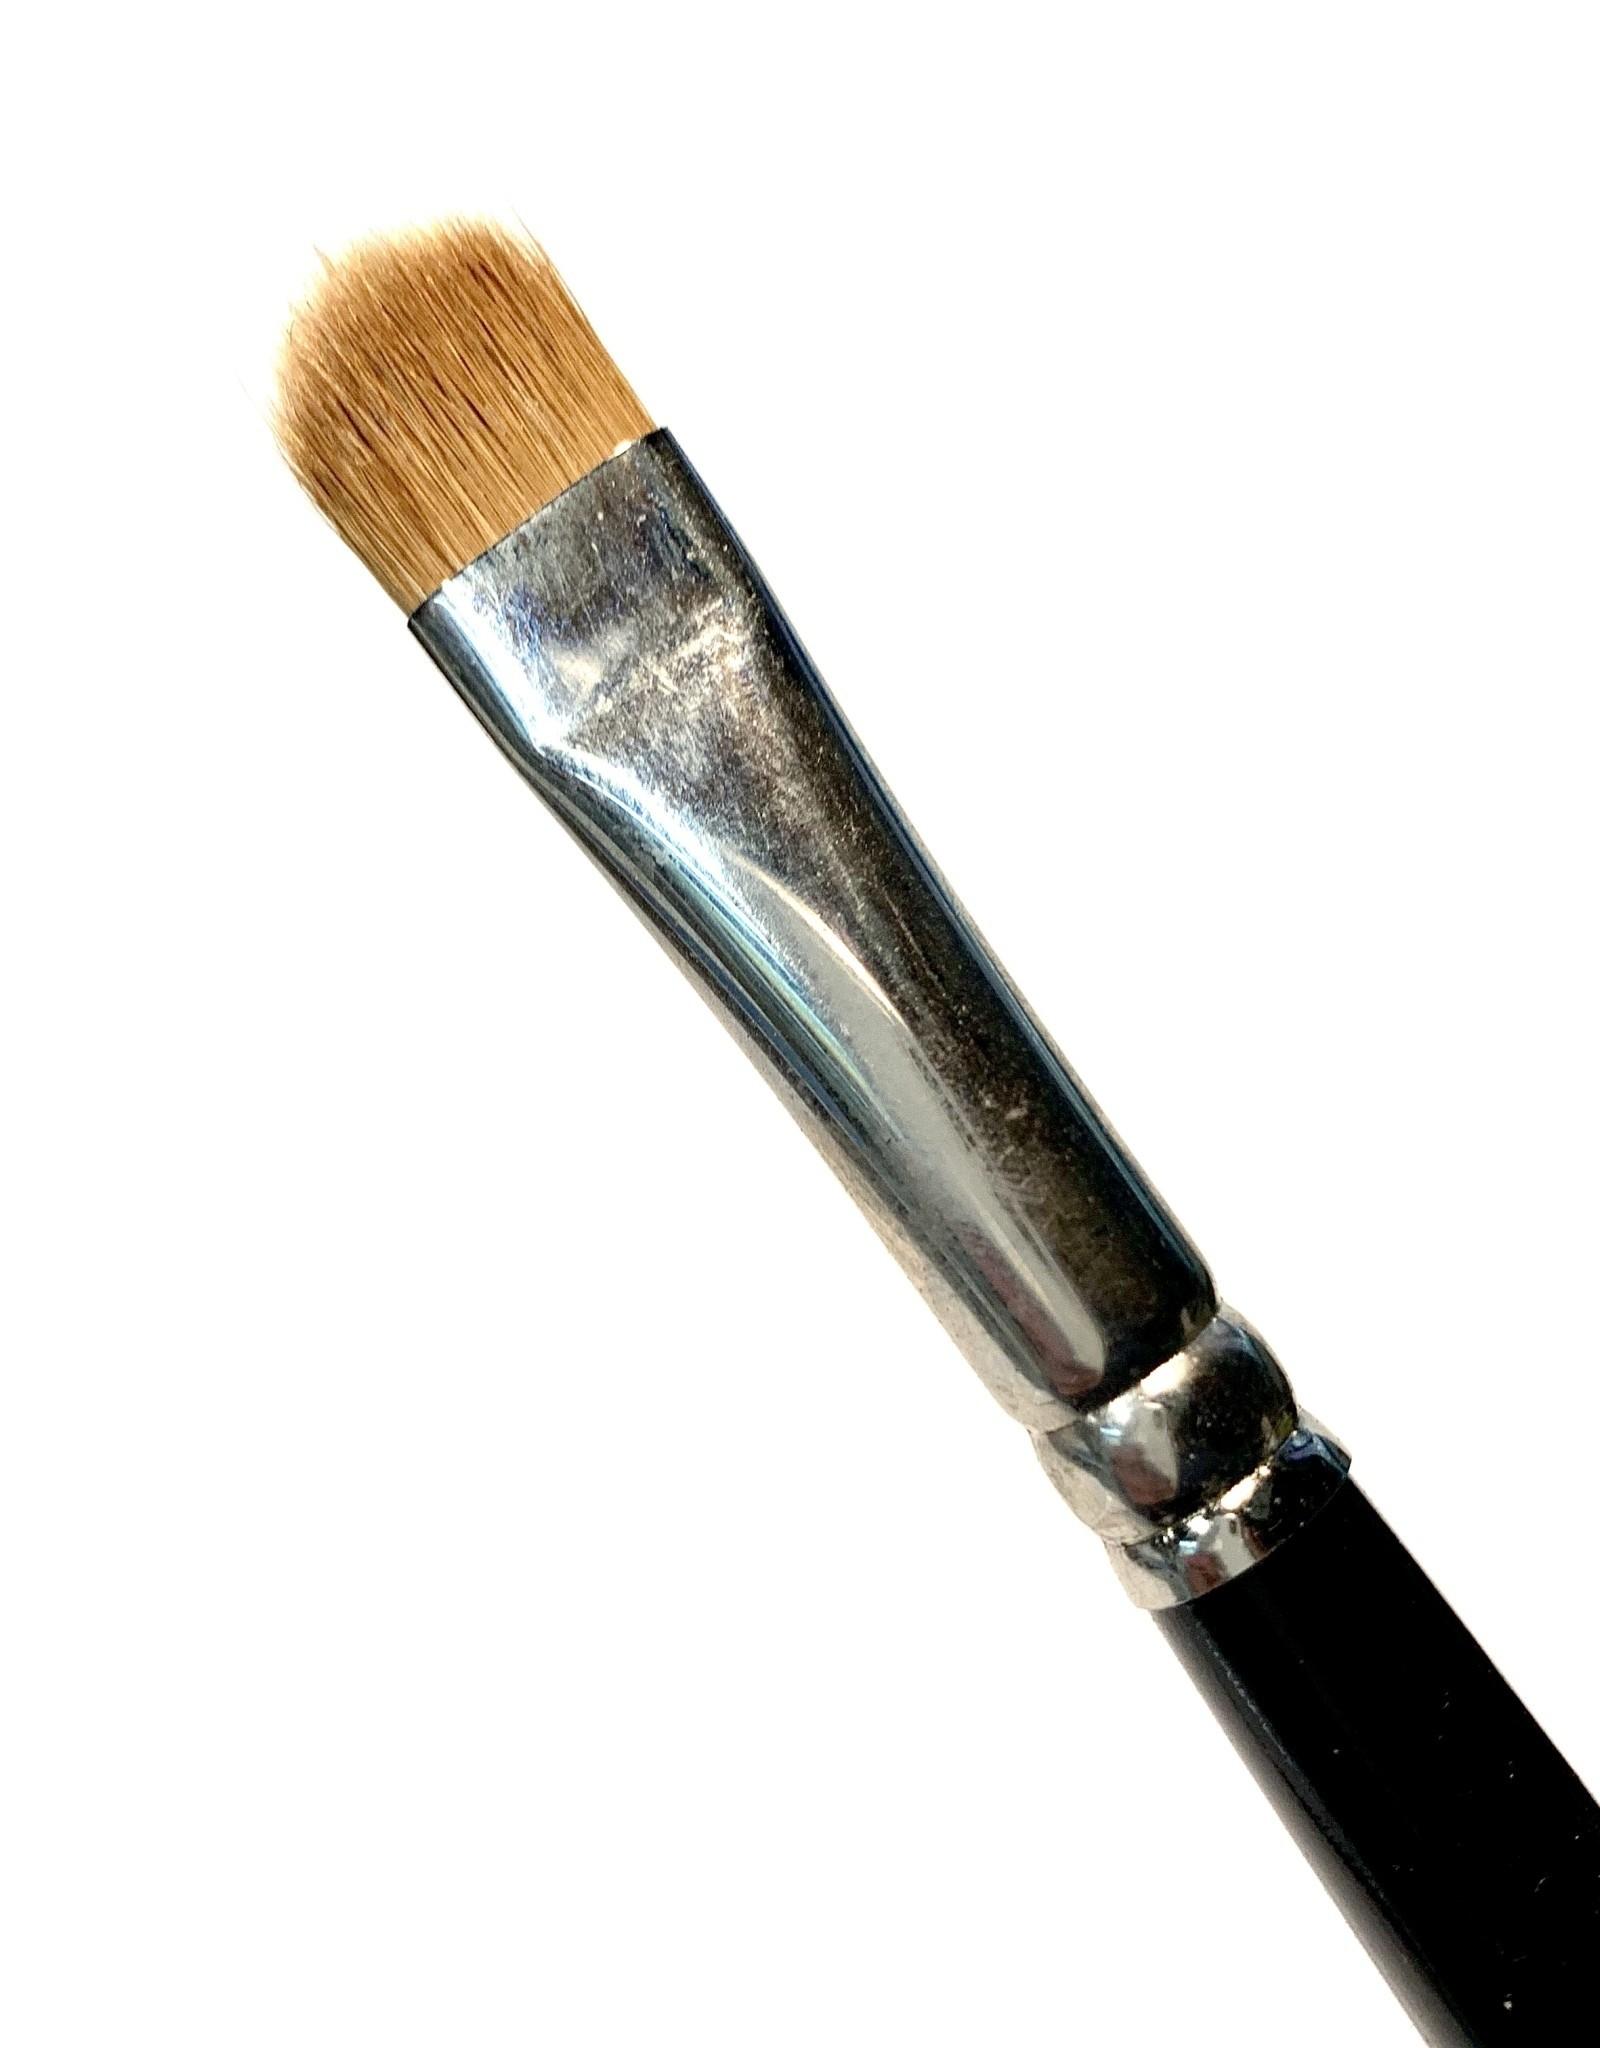 Paragon Pia Supreme Sable Brush, Filbert, 9915 #10